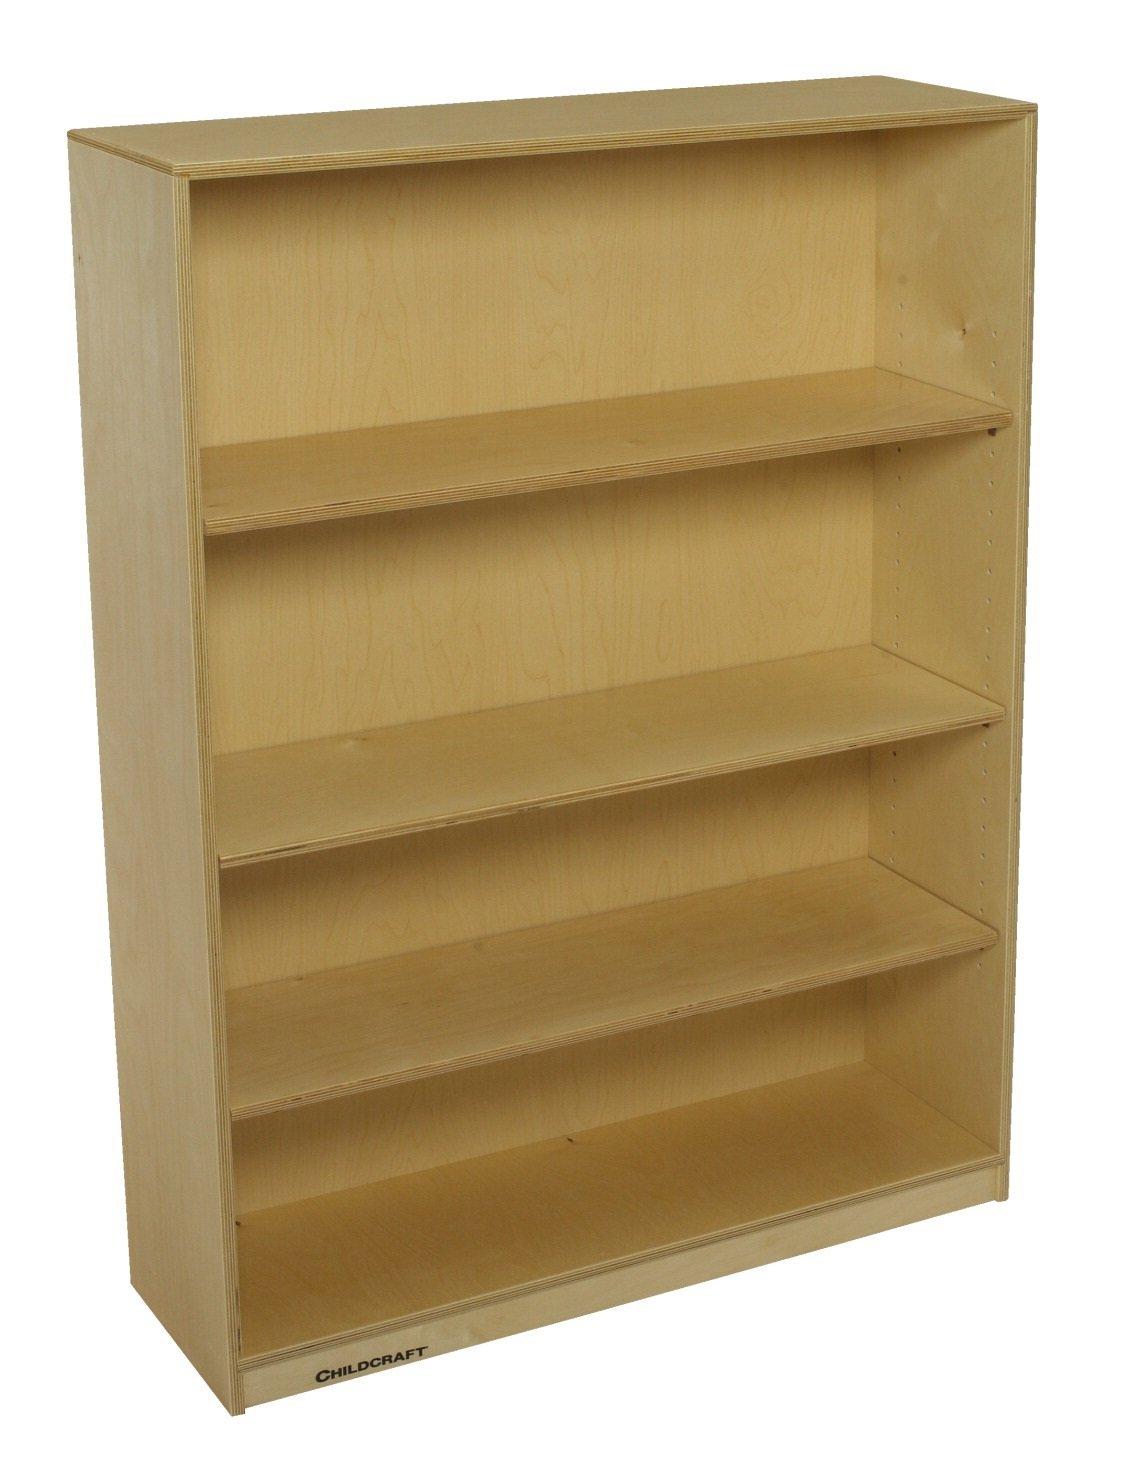 Bird in Hand 1291237 Adjustable Bookcase, Birch Veneer Panel, UV Acrylic, 3-Shelves, 36'' x 11-3/4'' x 36'', Natural Wood Tone